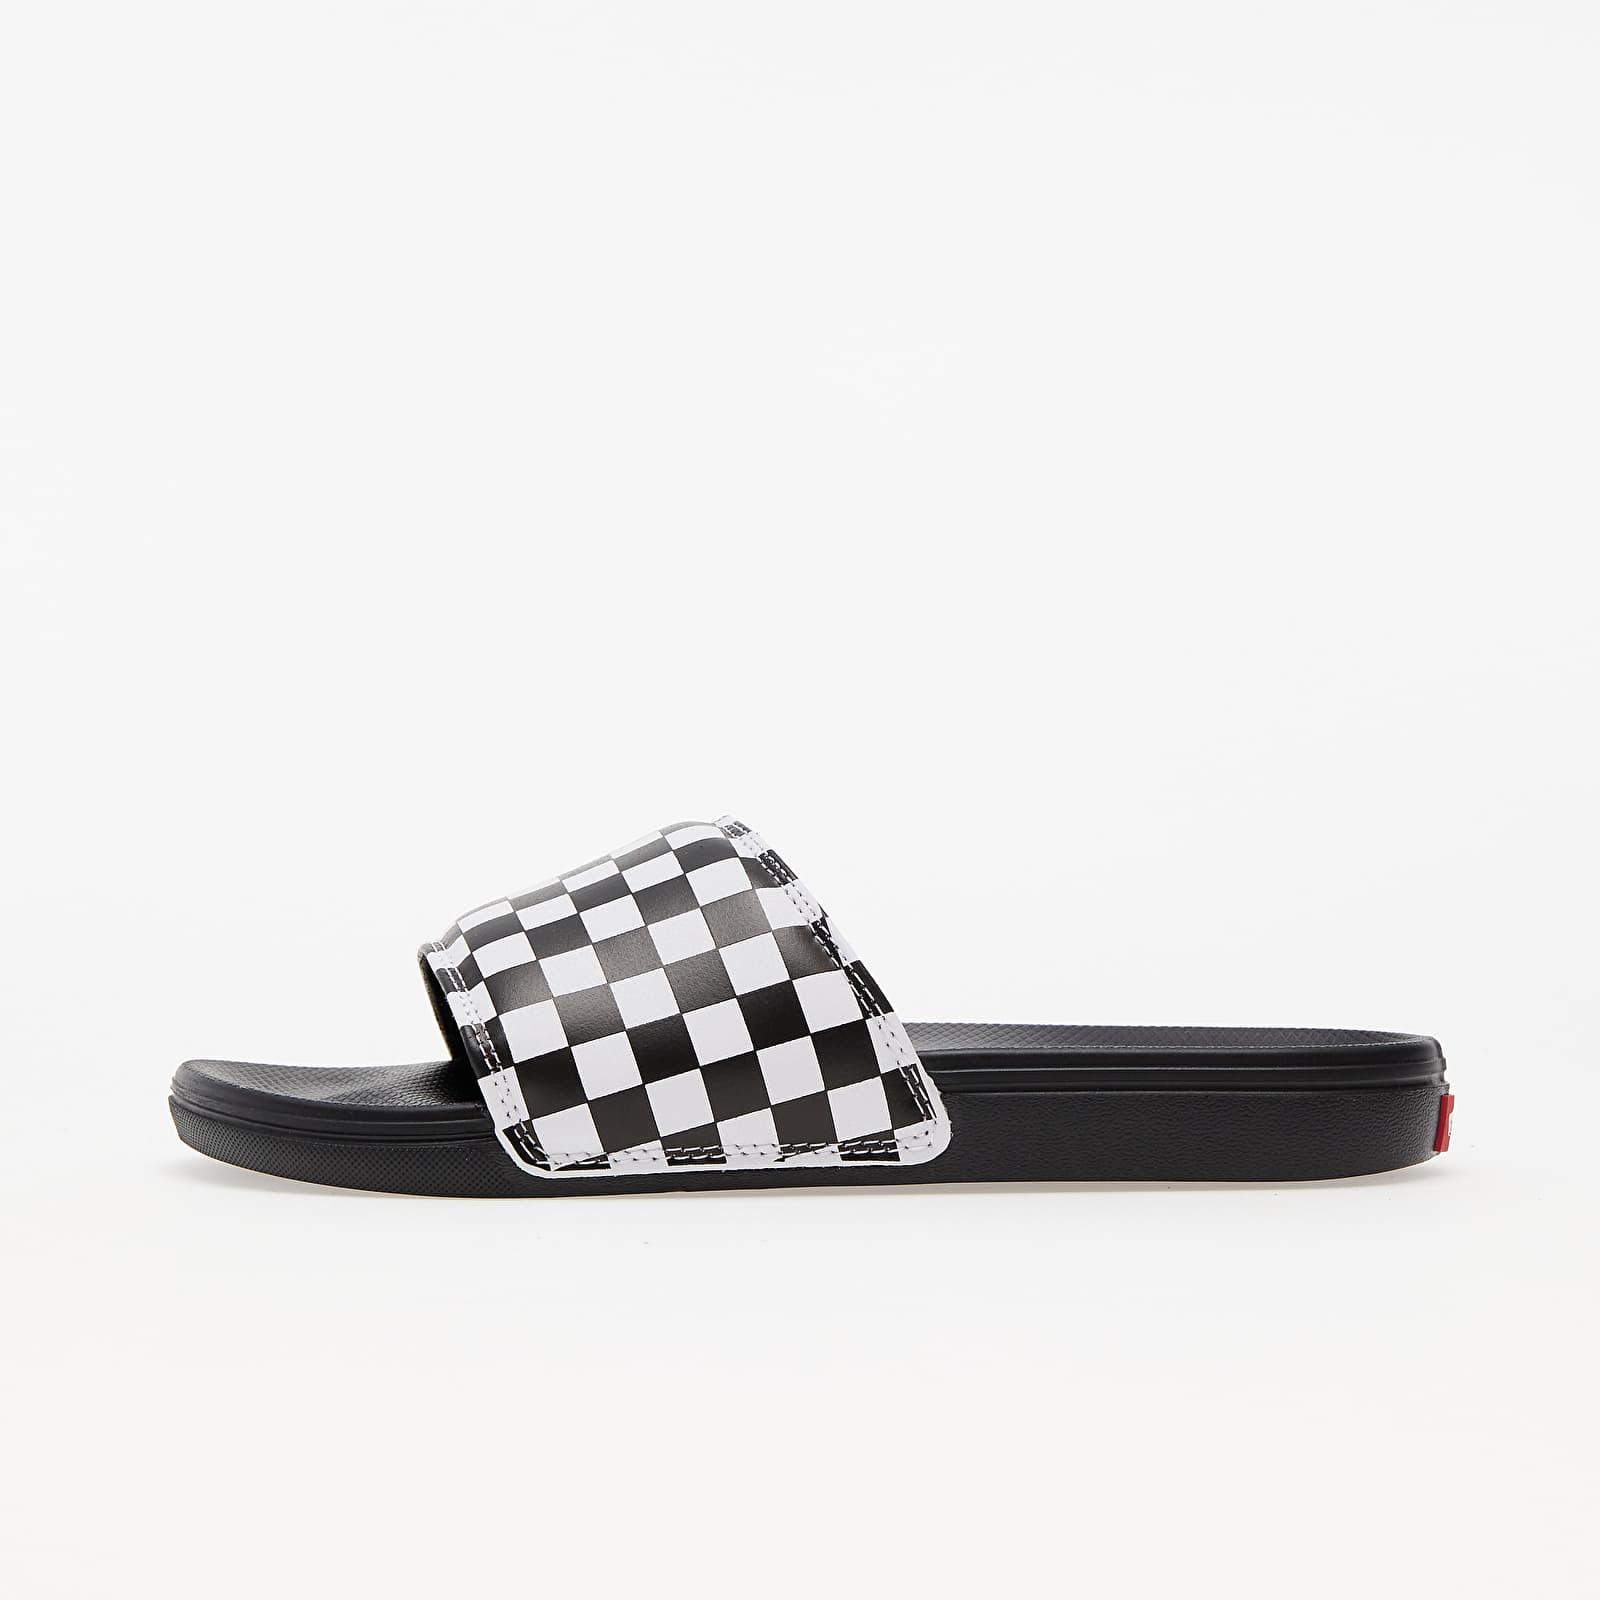 Vans La Costa Slide-On (Checkerboard) True White/ Black VN0A5HF527I1